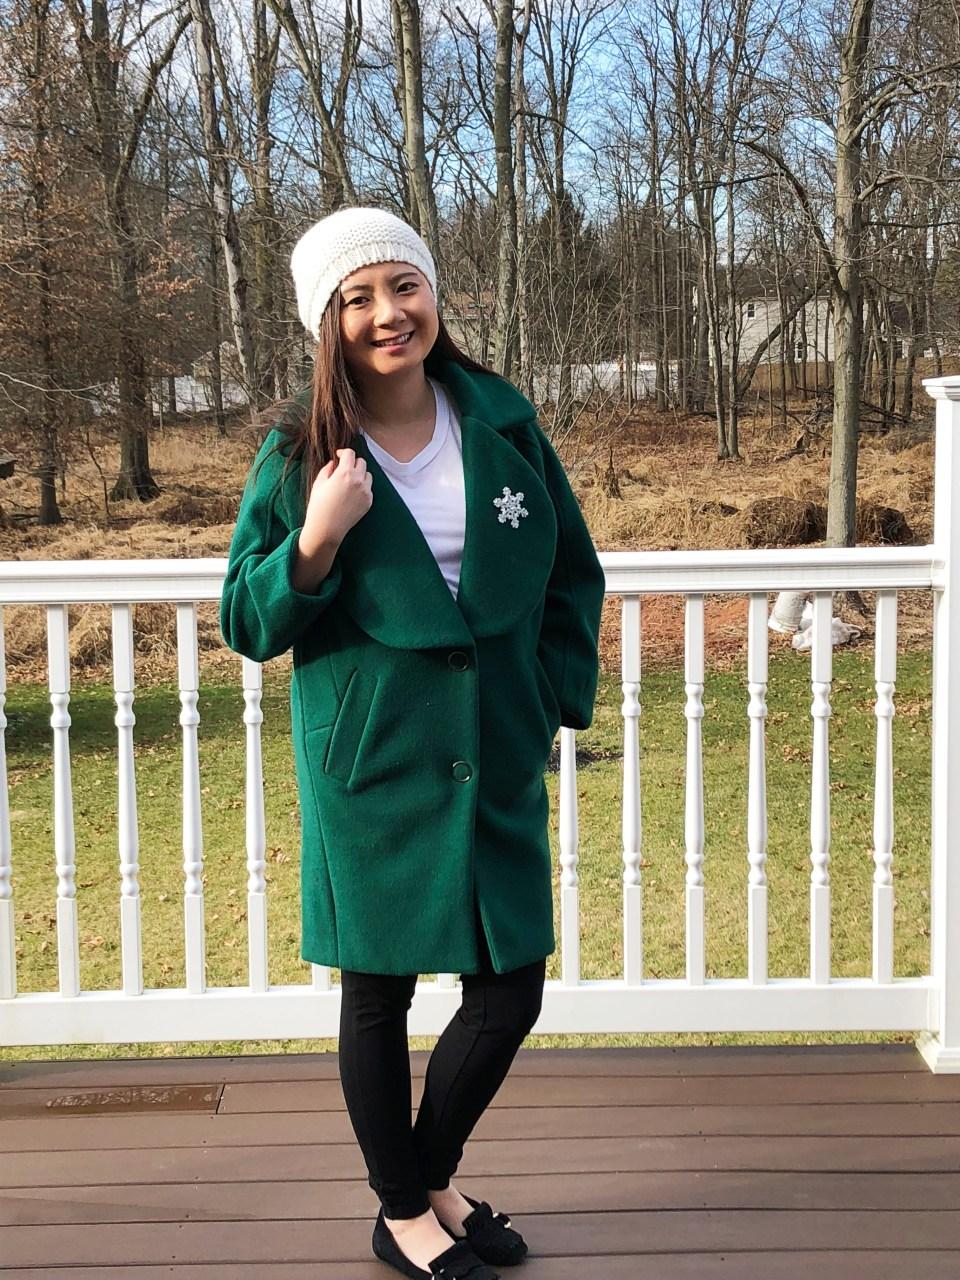 Green Lapel Coat + Snowflake Brooch 2